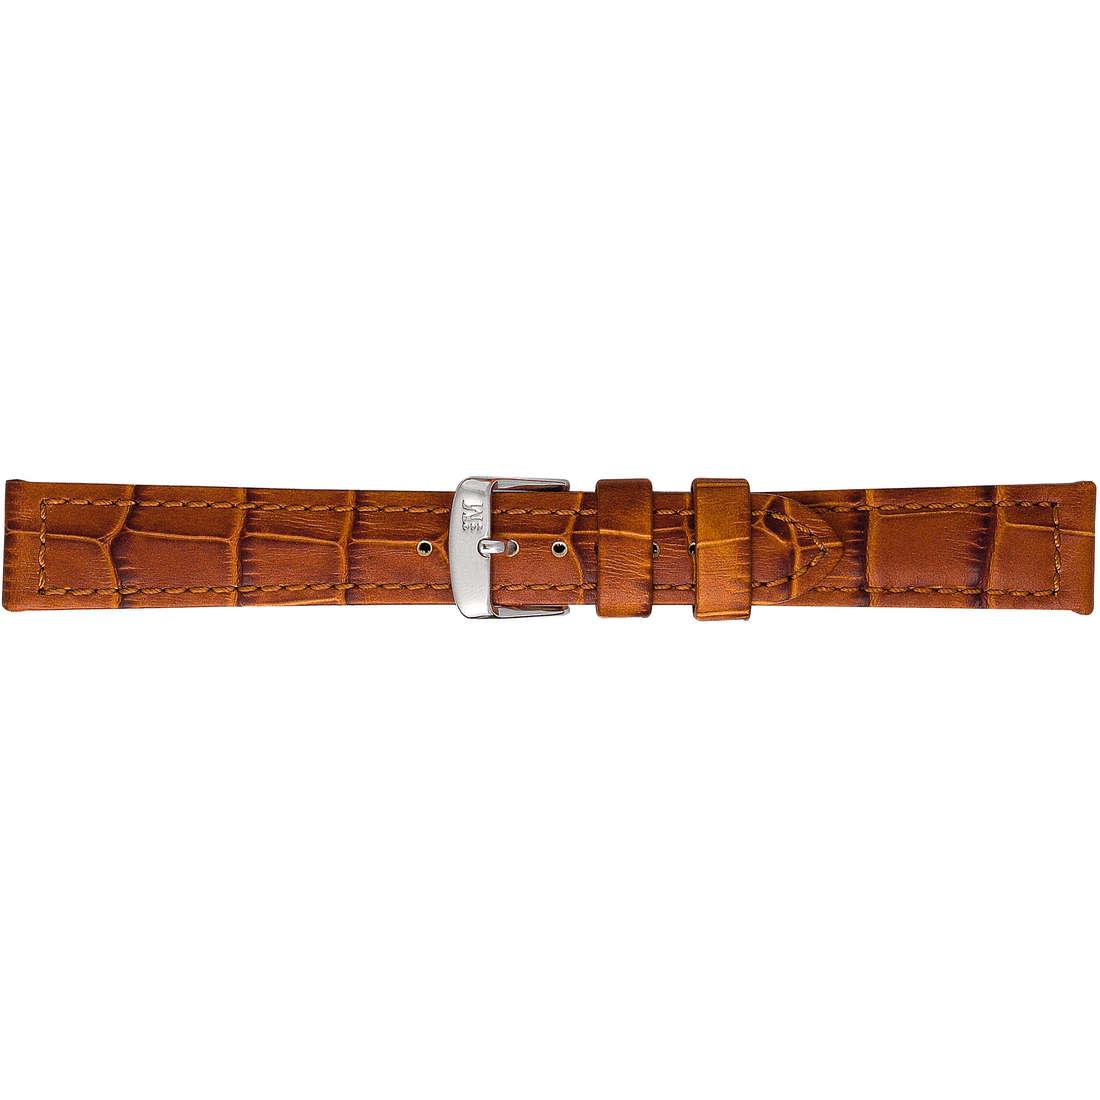 watch watch bands watch straps man Morellato Manufatti A01U2226480041CR22